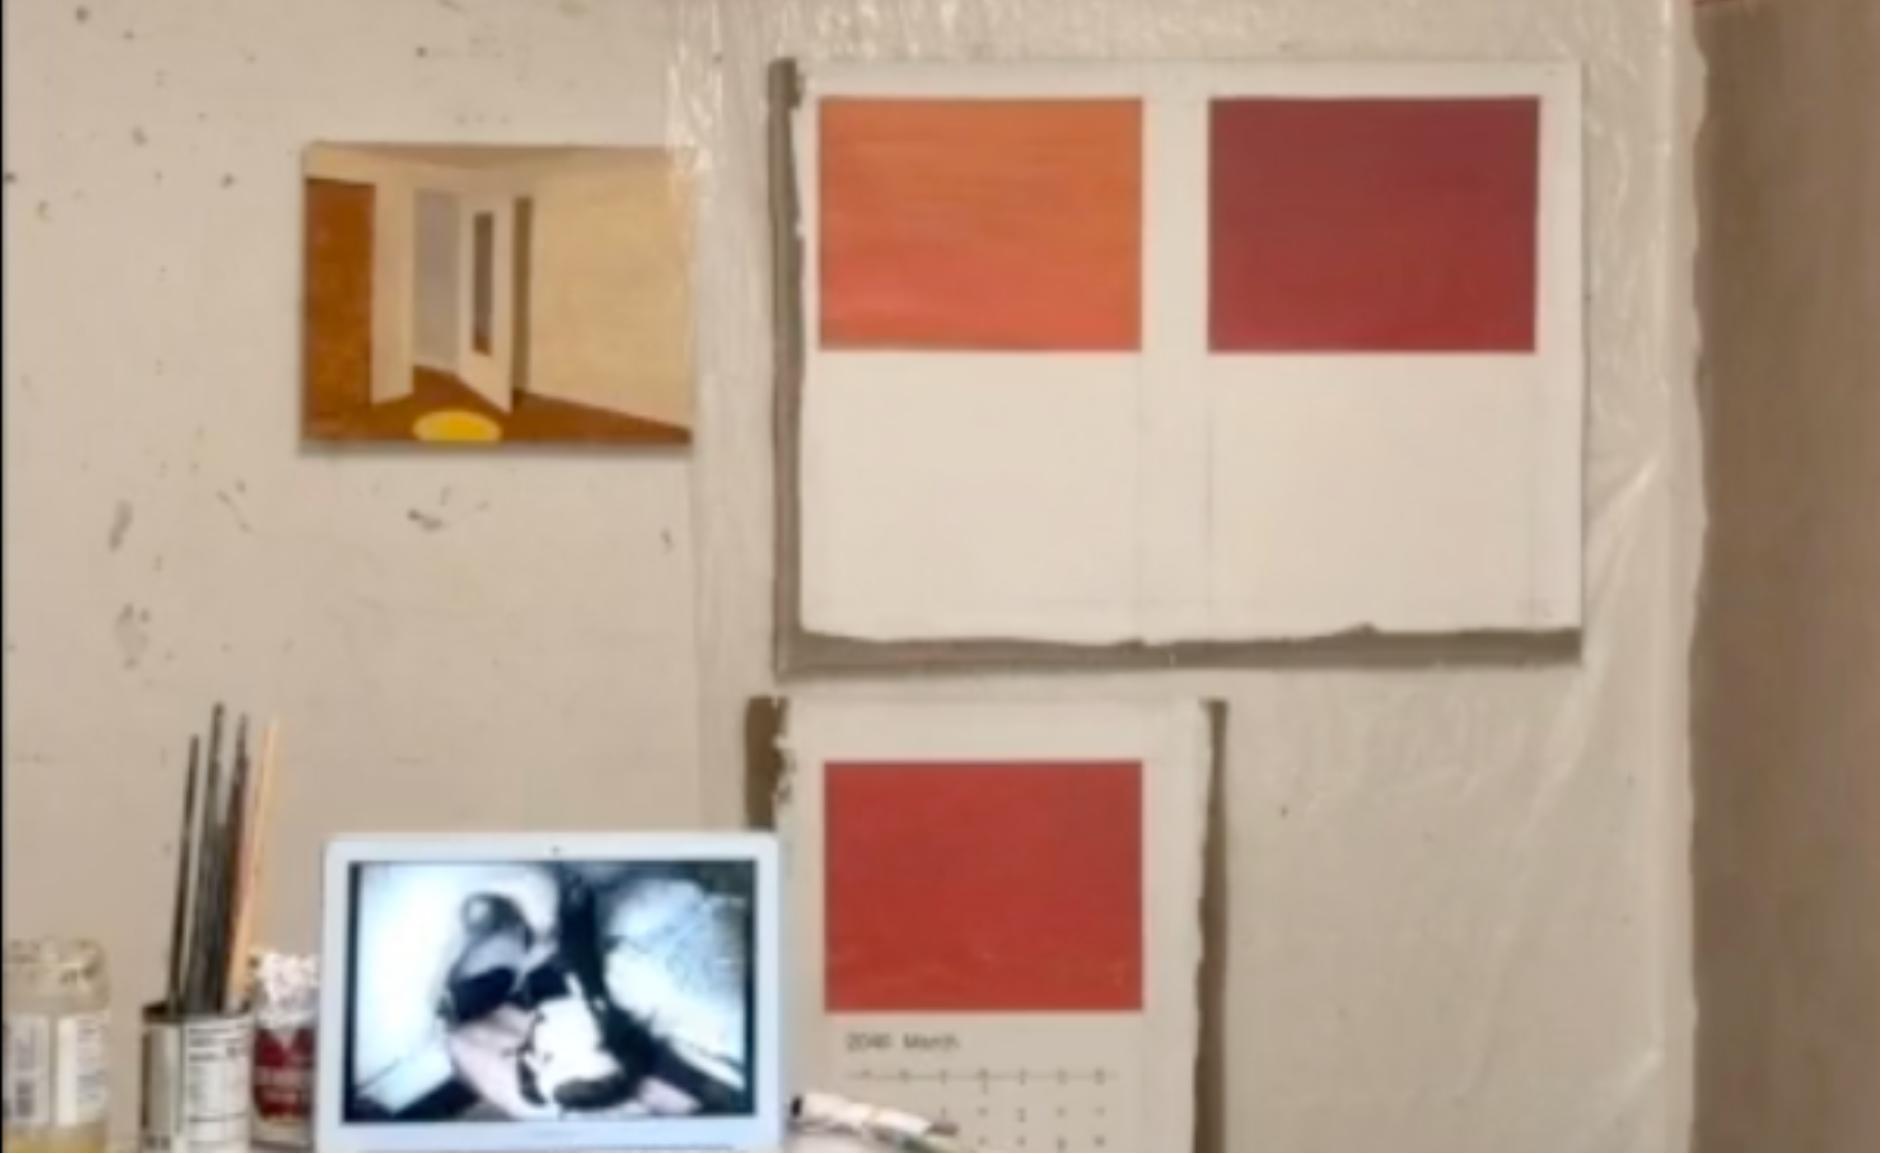 Roger White | Studio Visit